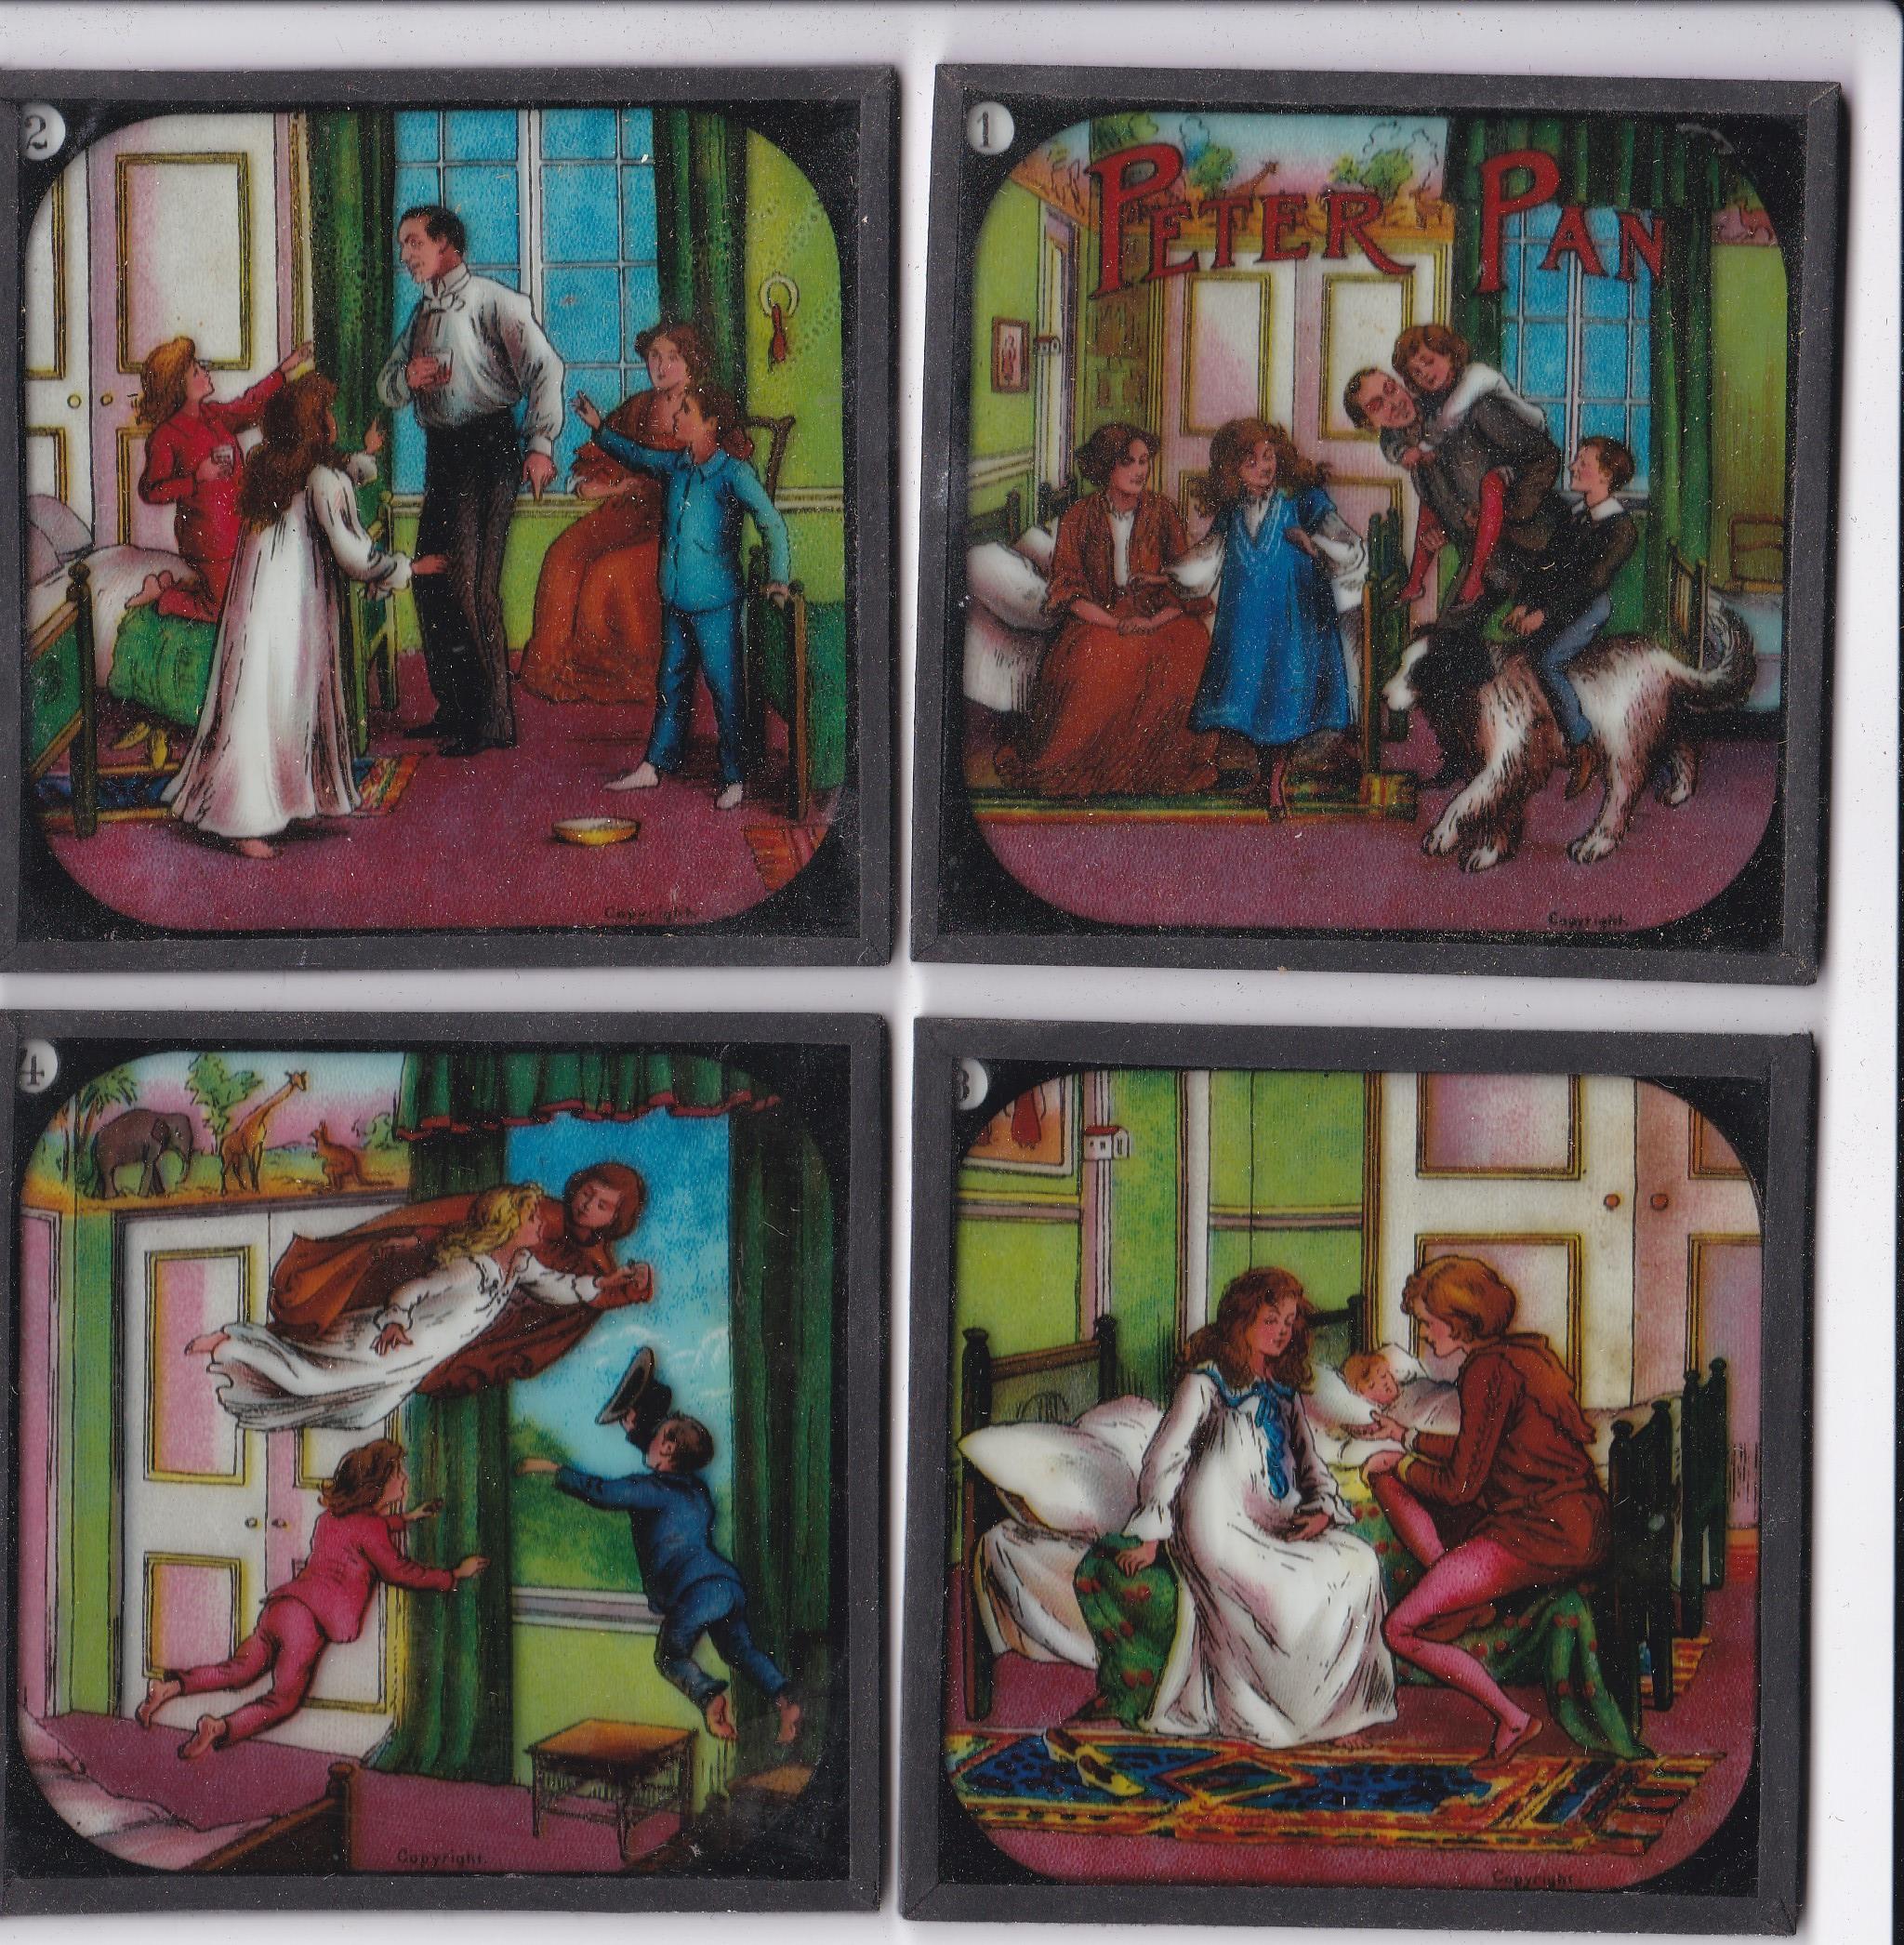 Peter Pan Magic Lantern Coloured slides, Primus Junior Lecturers series Peter Pan Magic Lantern - Image 3 of 4